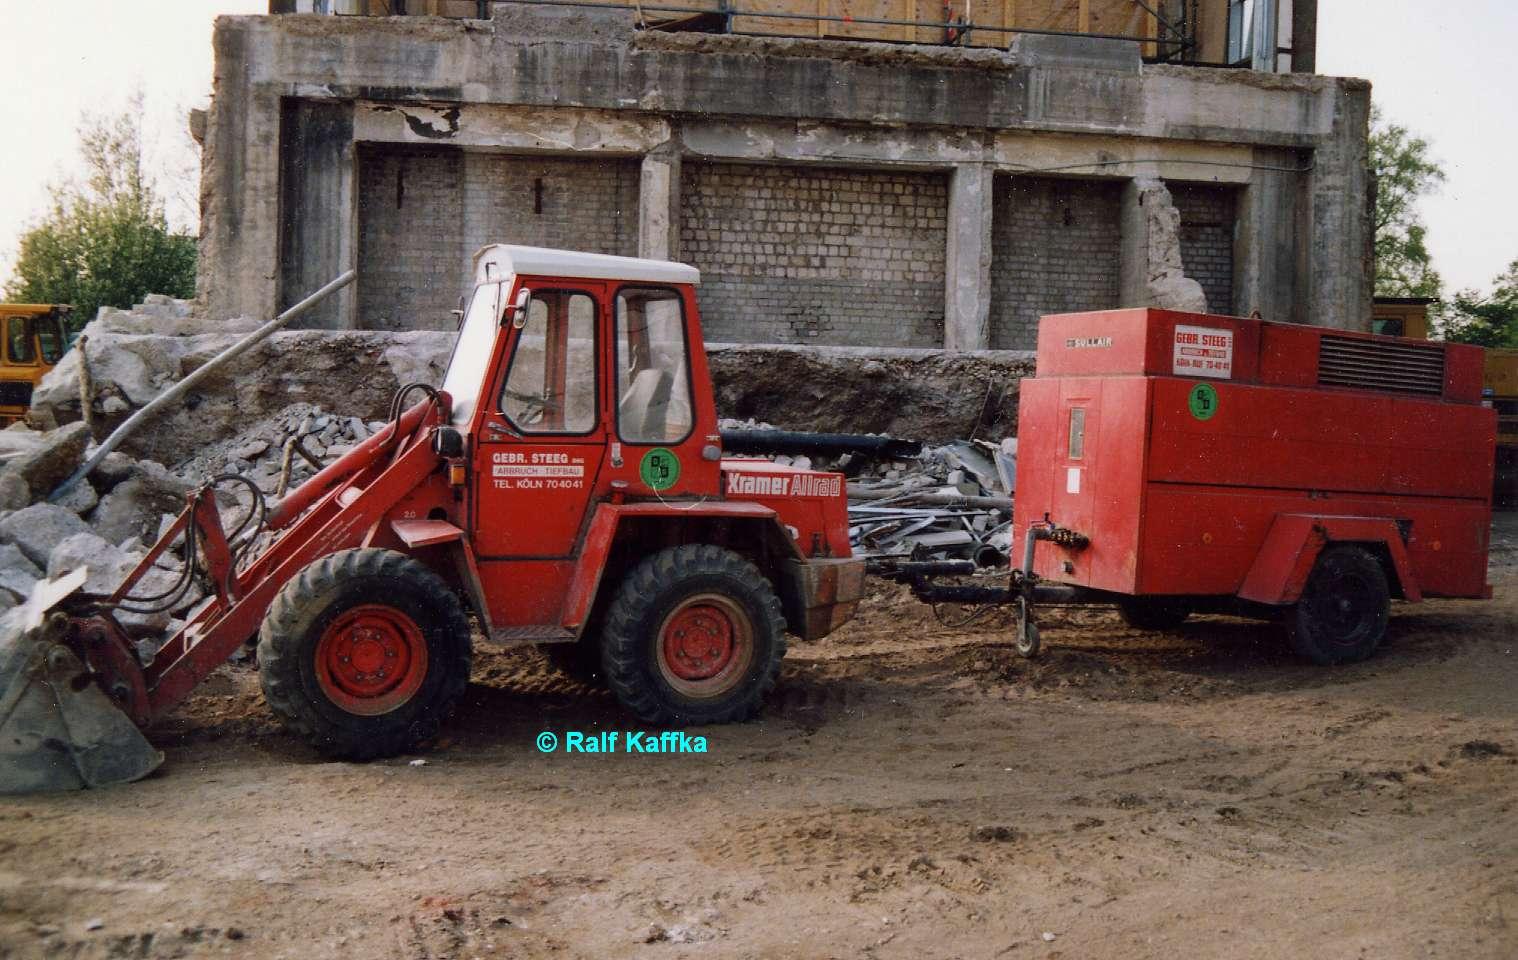 Baufirmen In Köln gebr steeg abbruch köln seite 2 baufirmen baumaschinen bau